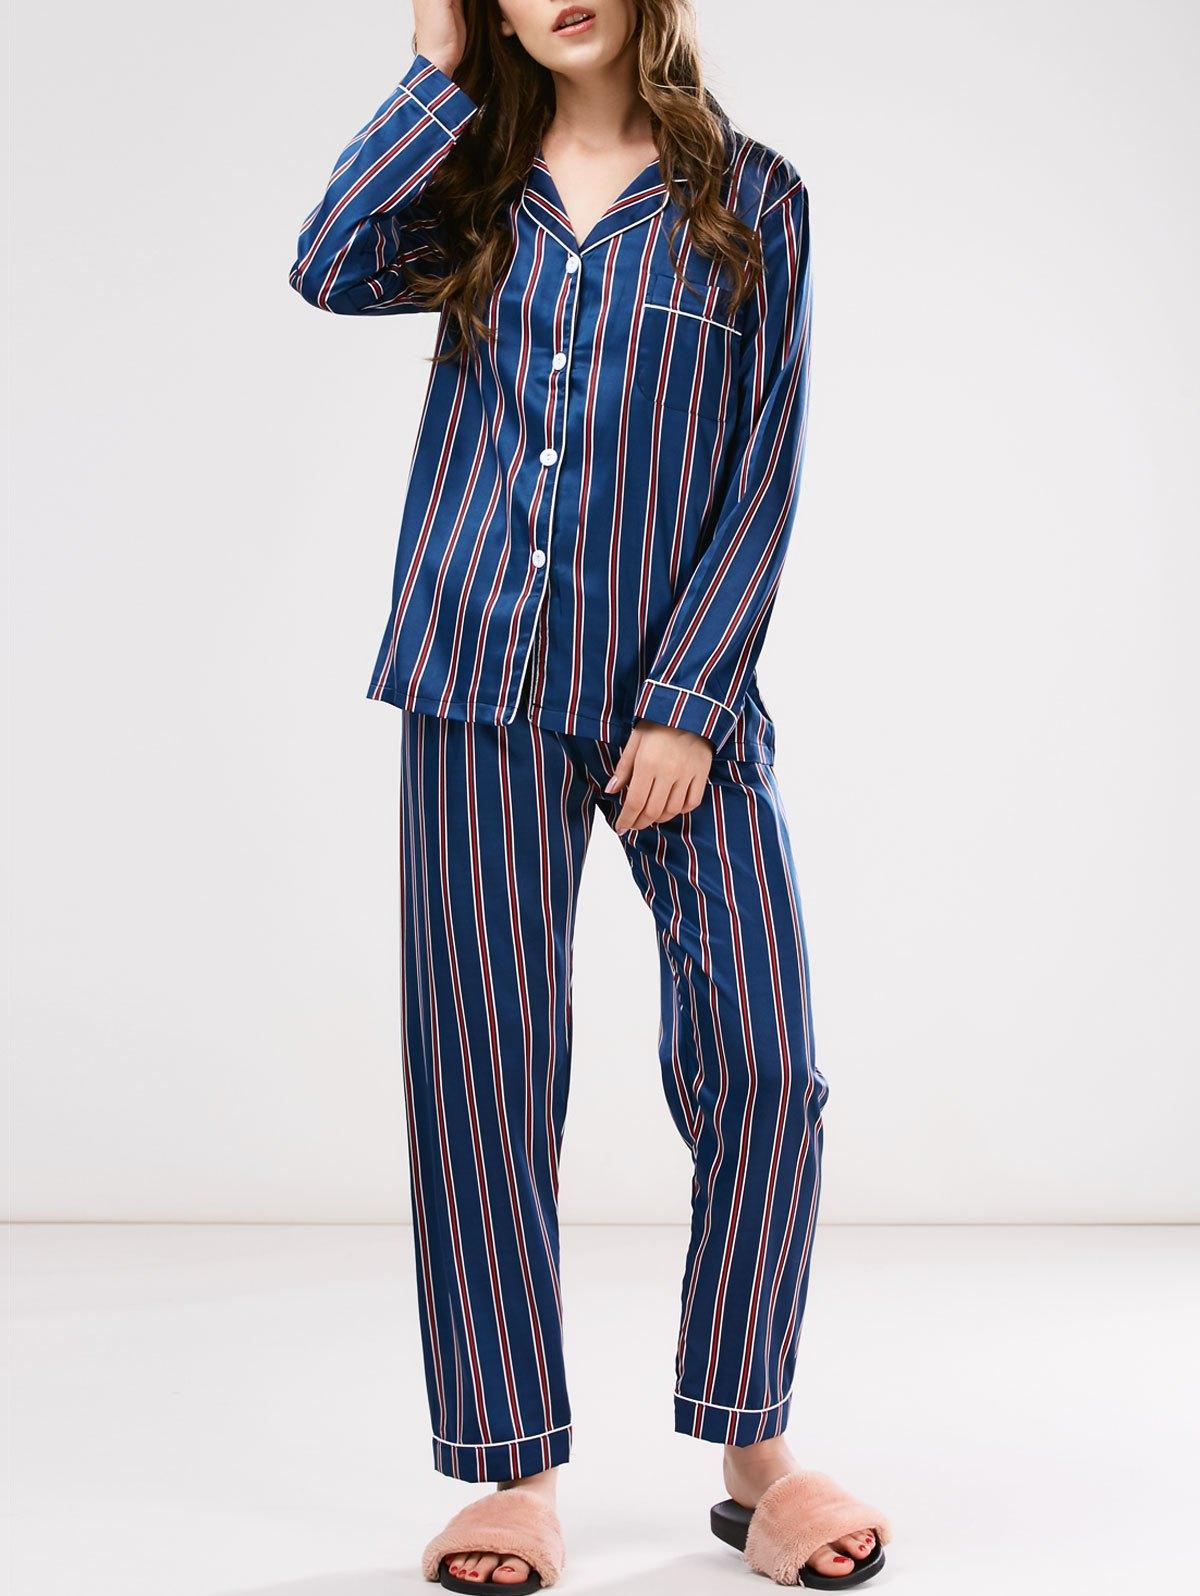 Striped Button Up Cotton Pajamas Set